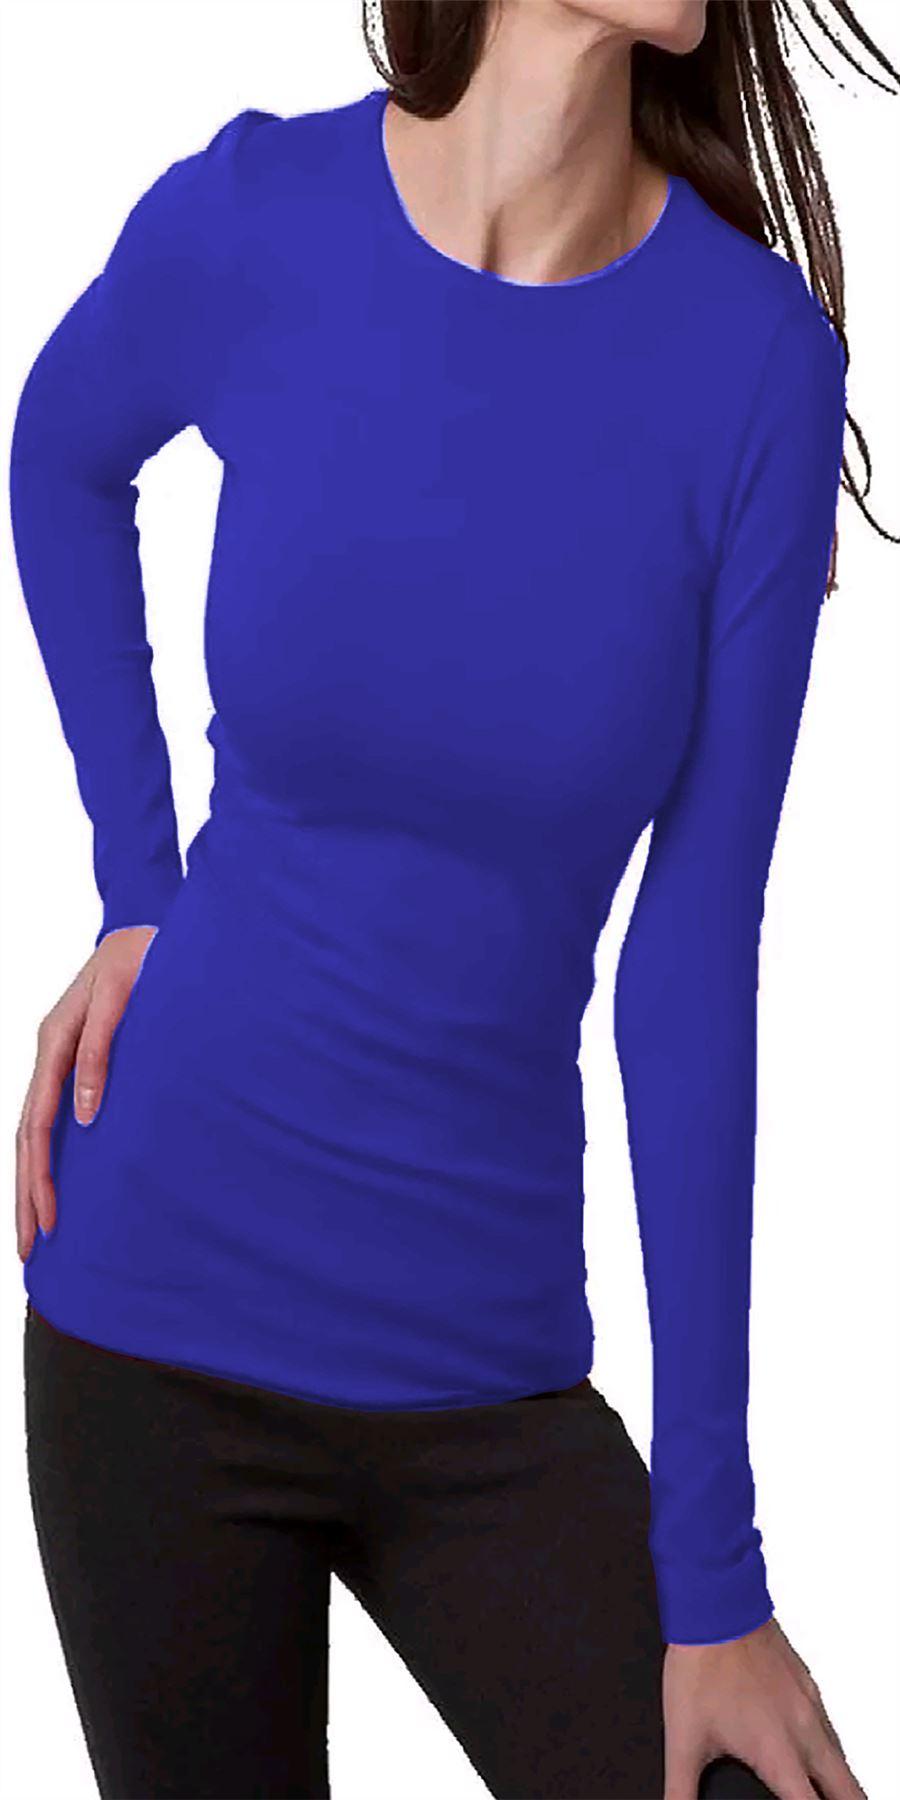 Donna-manica-lunga-scollo-tondo-Plain-BASIC-STRETCH-T-shirt-Casual-Tops